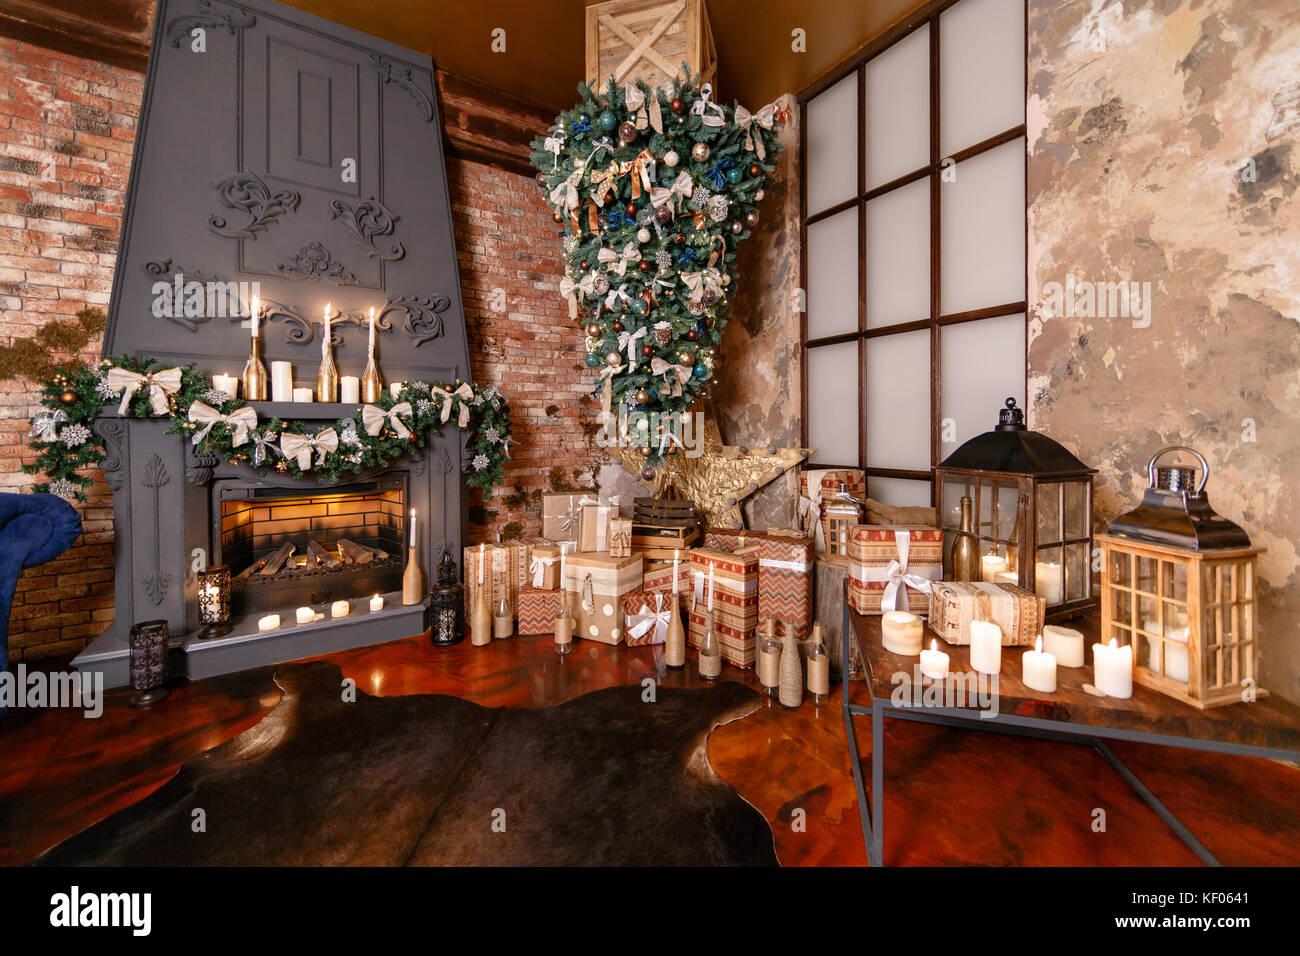 Upside Down Christmas Tree Ideas.Alternative Tree Upside Down On The Ceiling Winter Home